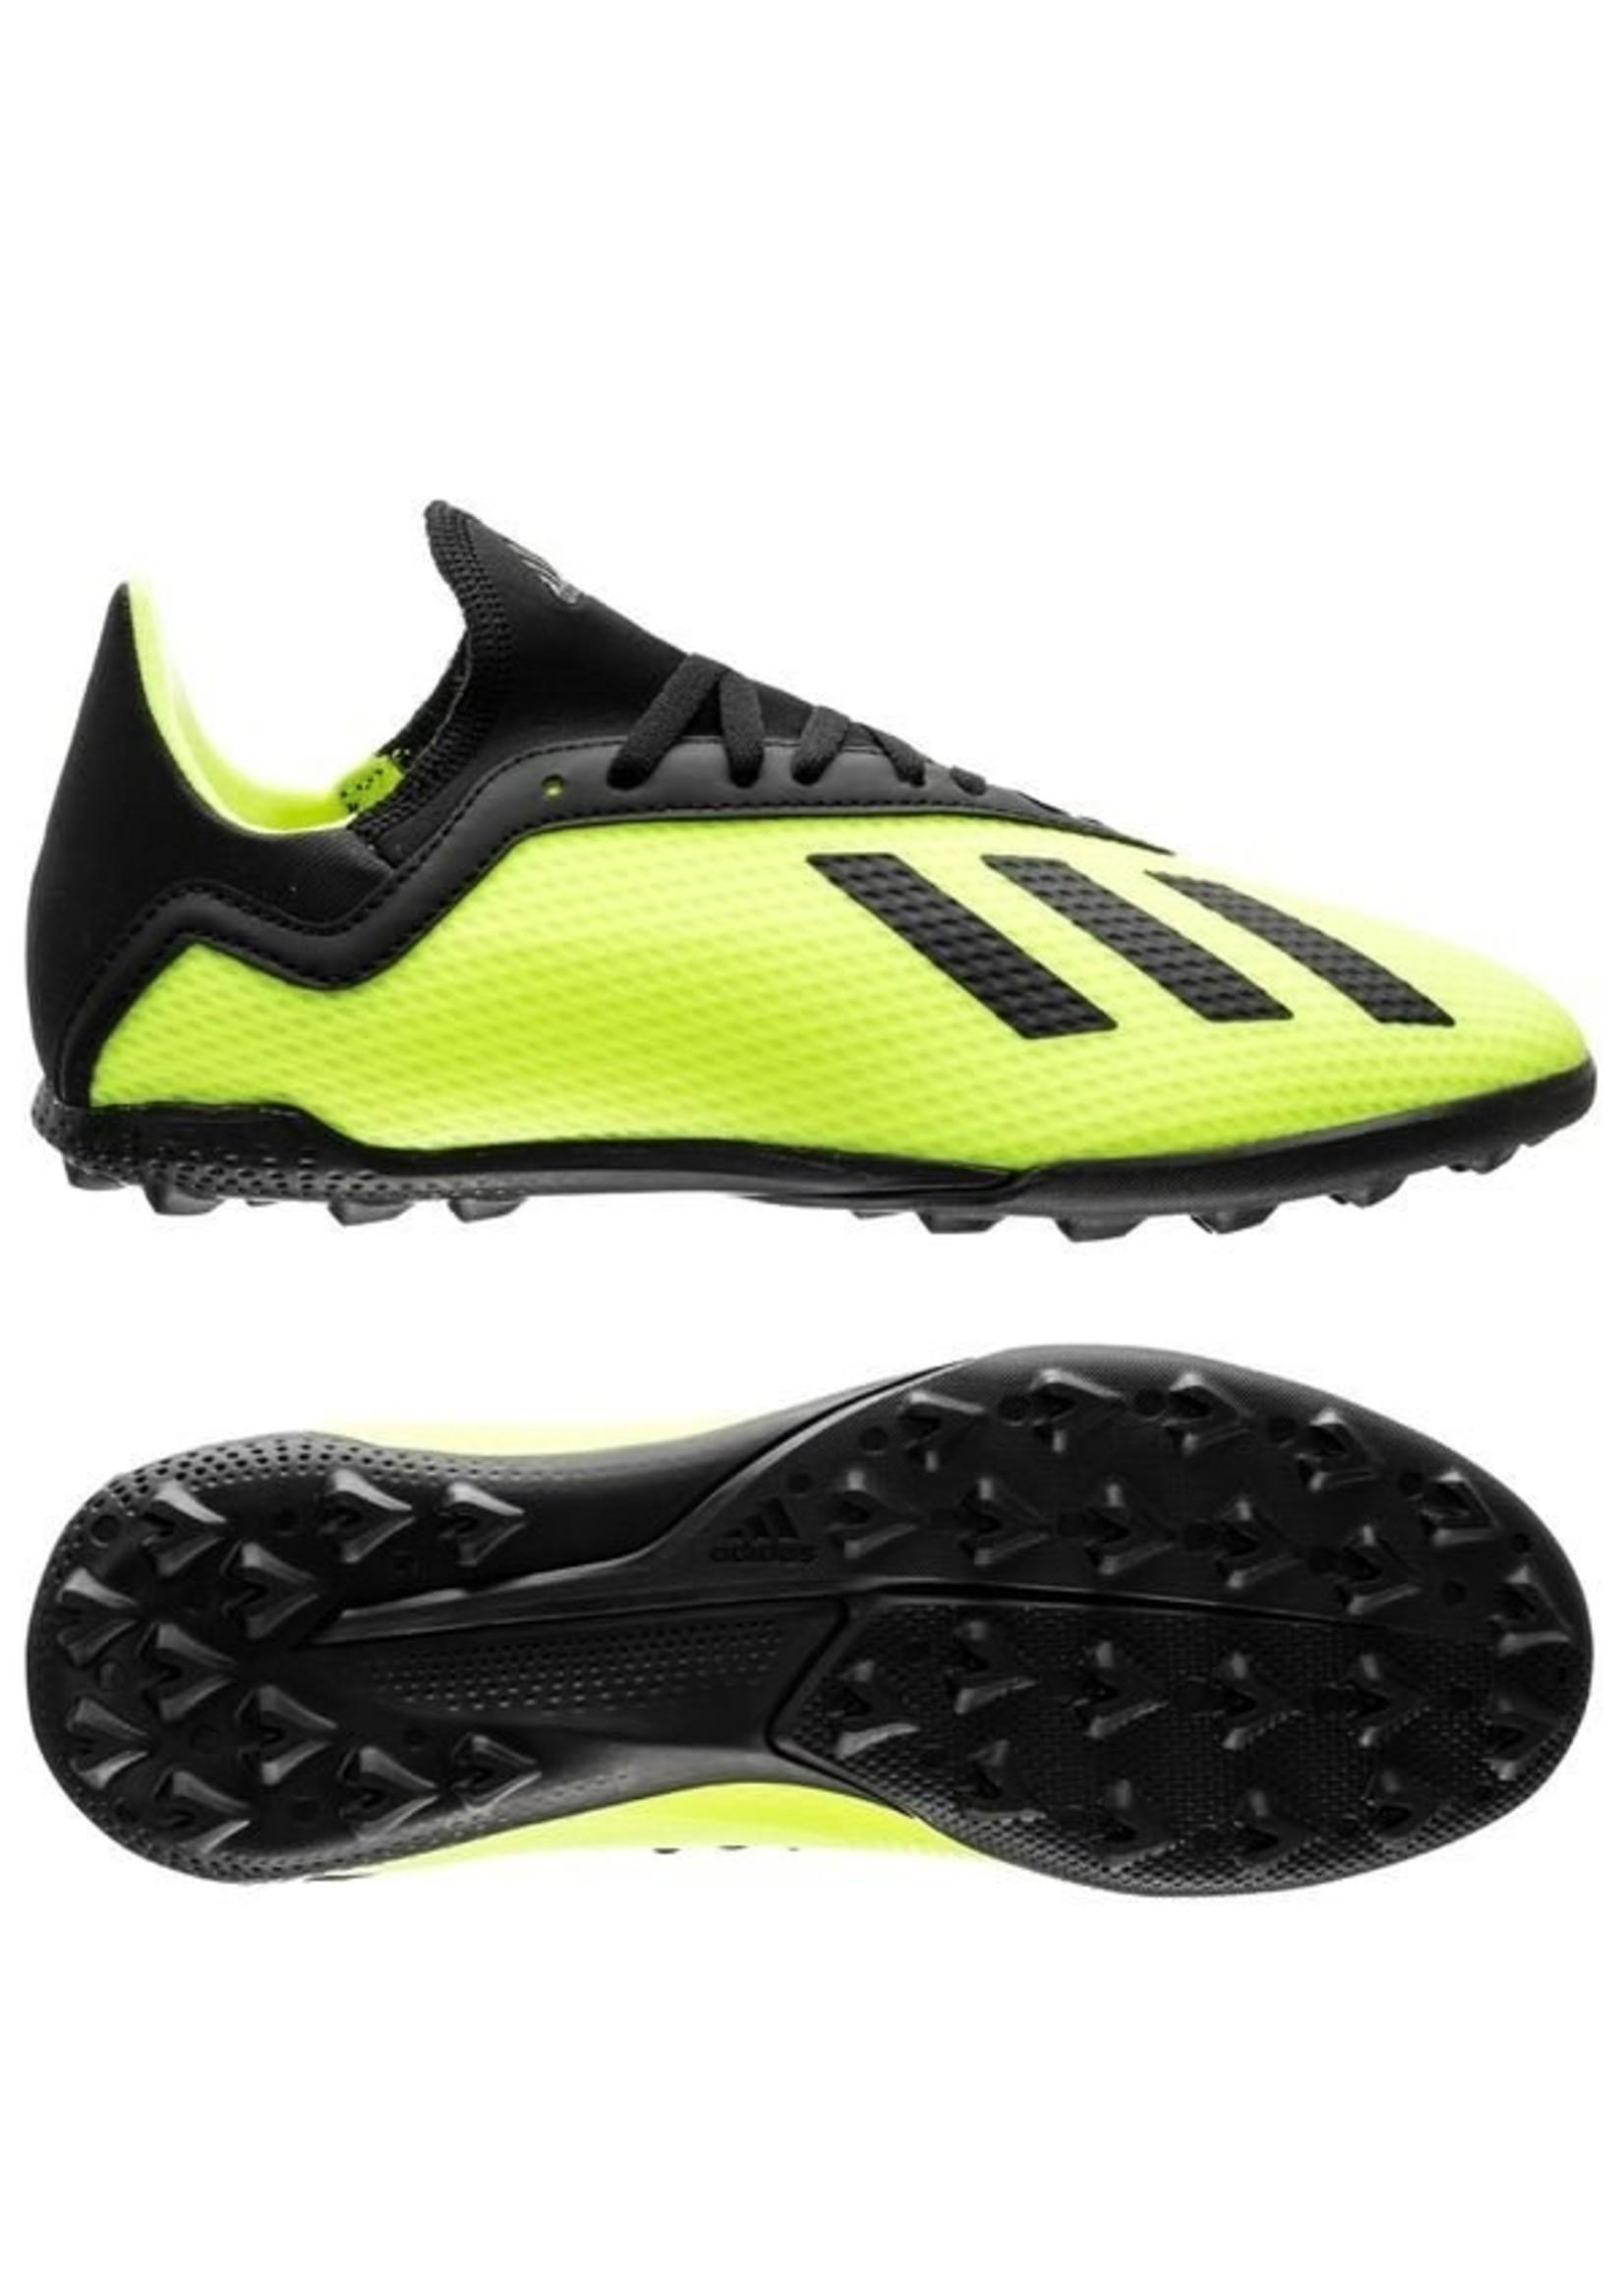 Adidas X TANGO 18.3 TF JR